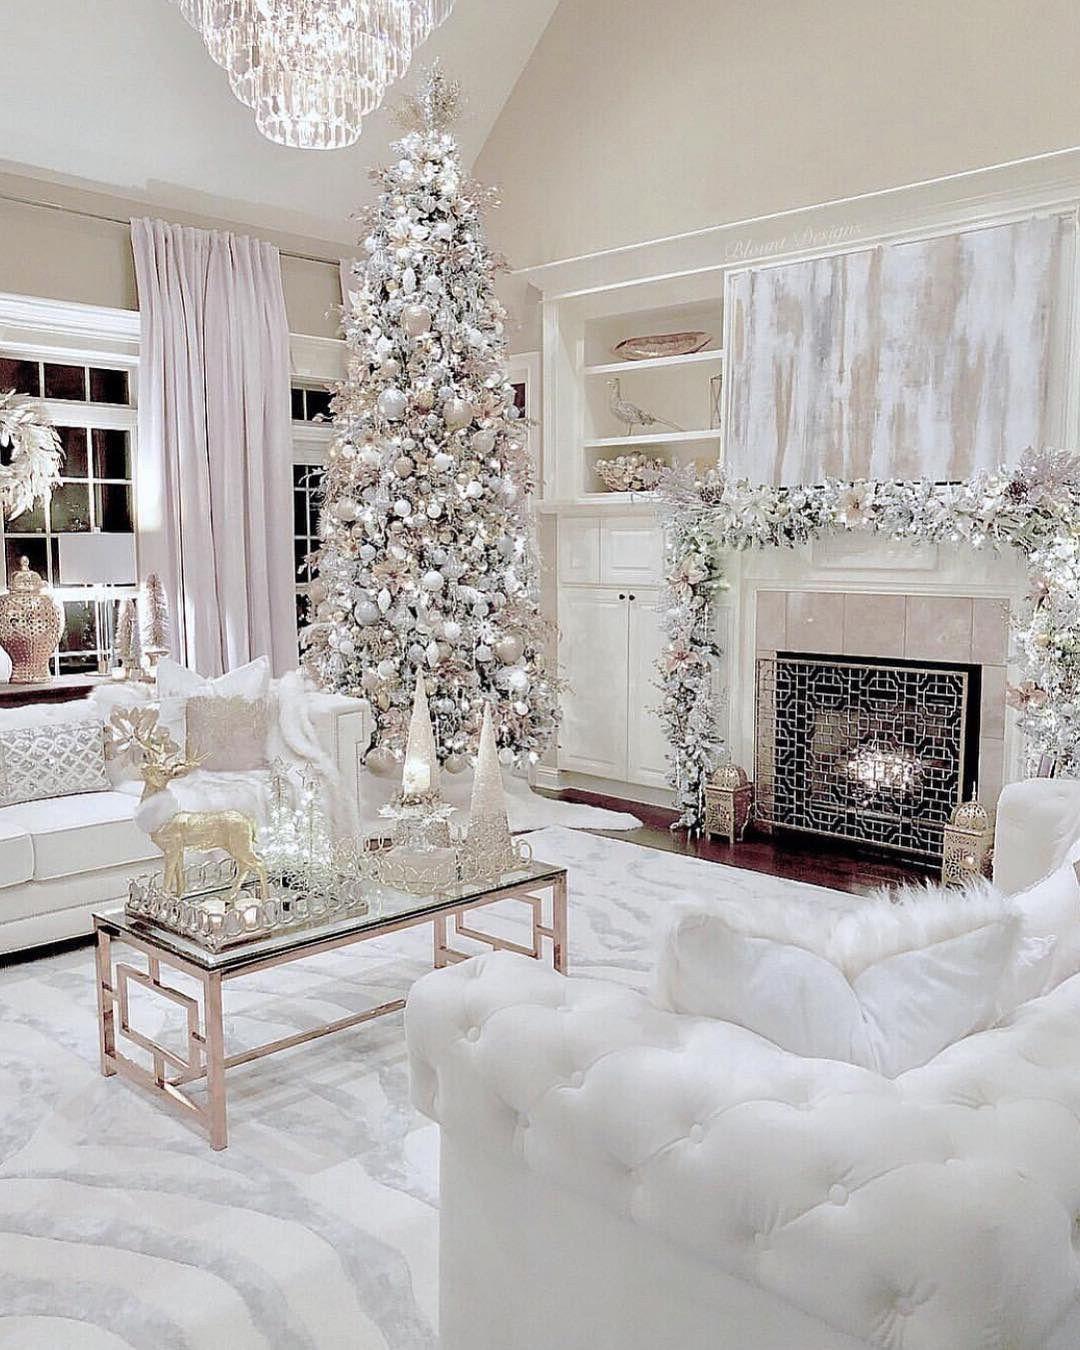 Christmas Home Decor 2019.44 Luxurious Interior Home Decor 2019 That Inspire